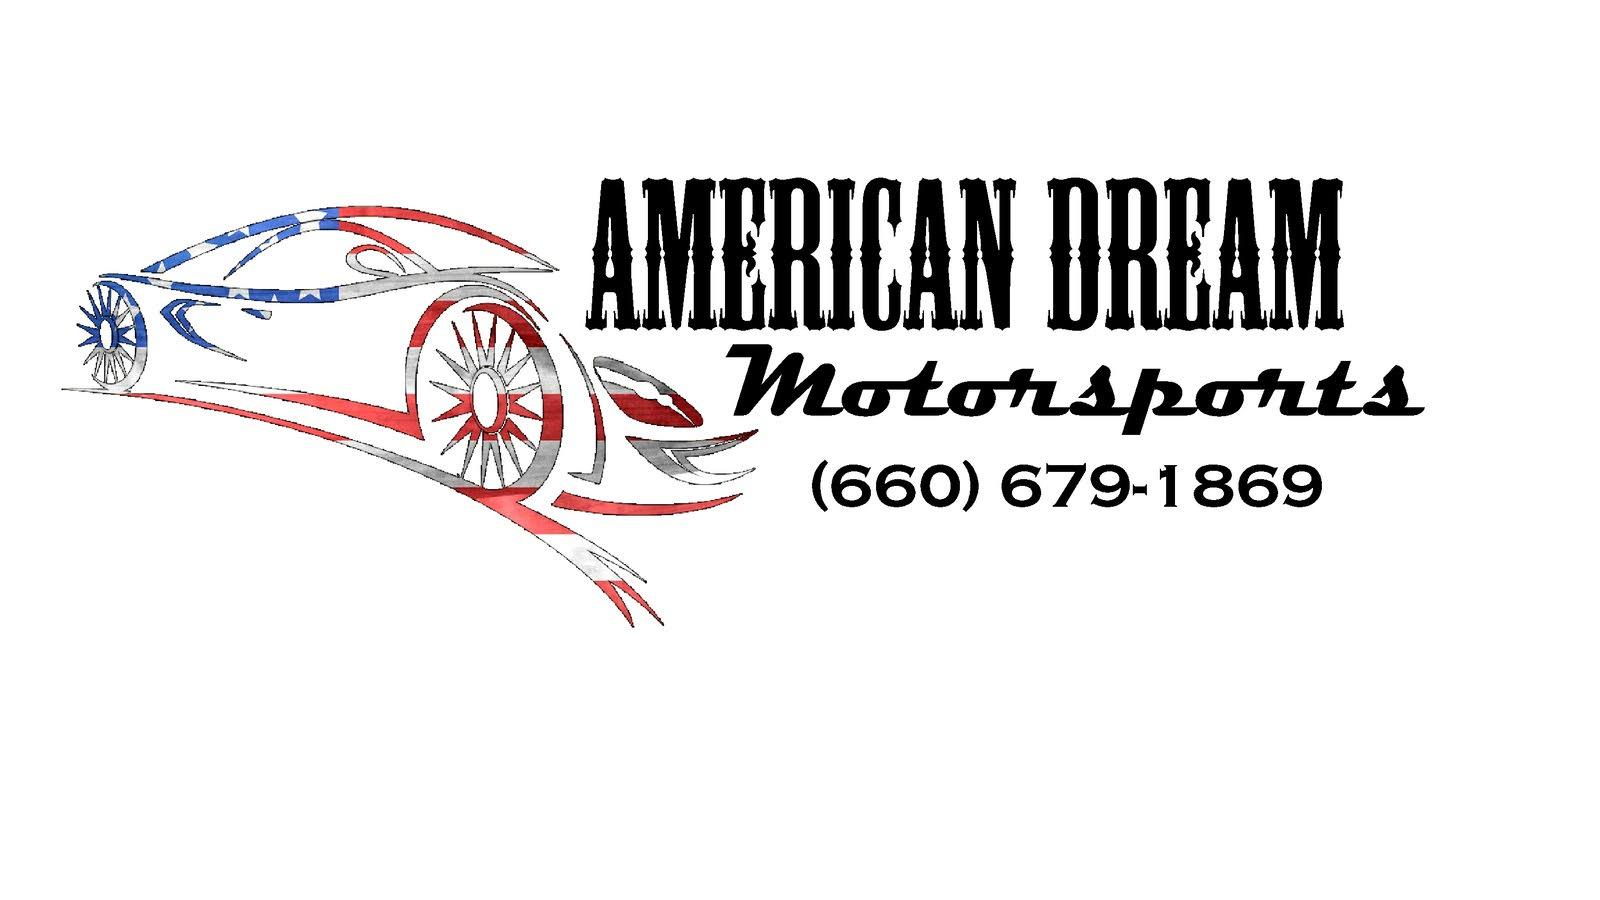 American Dream Motorsports Archie Mo Read Consumer